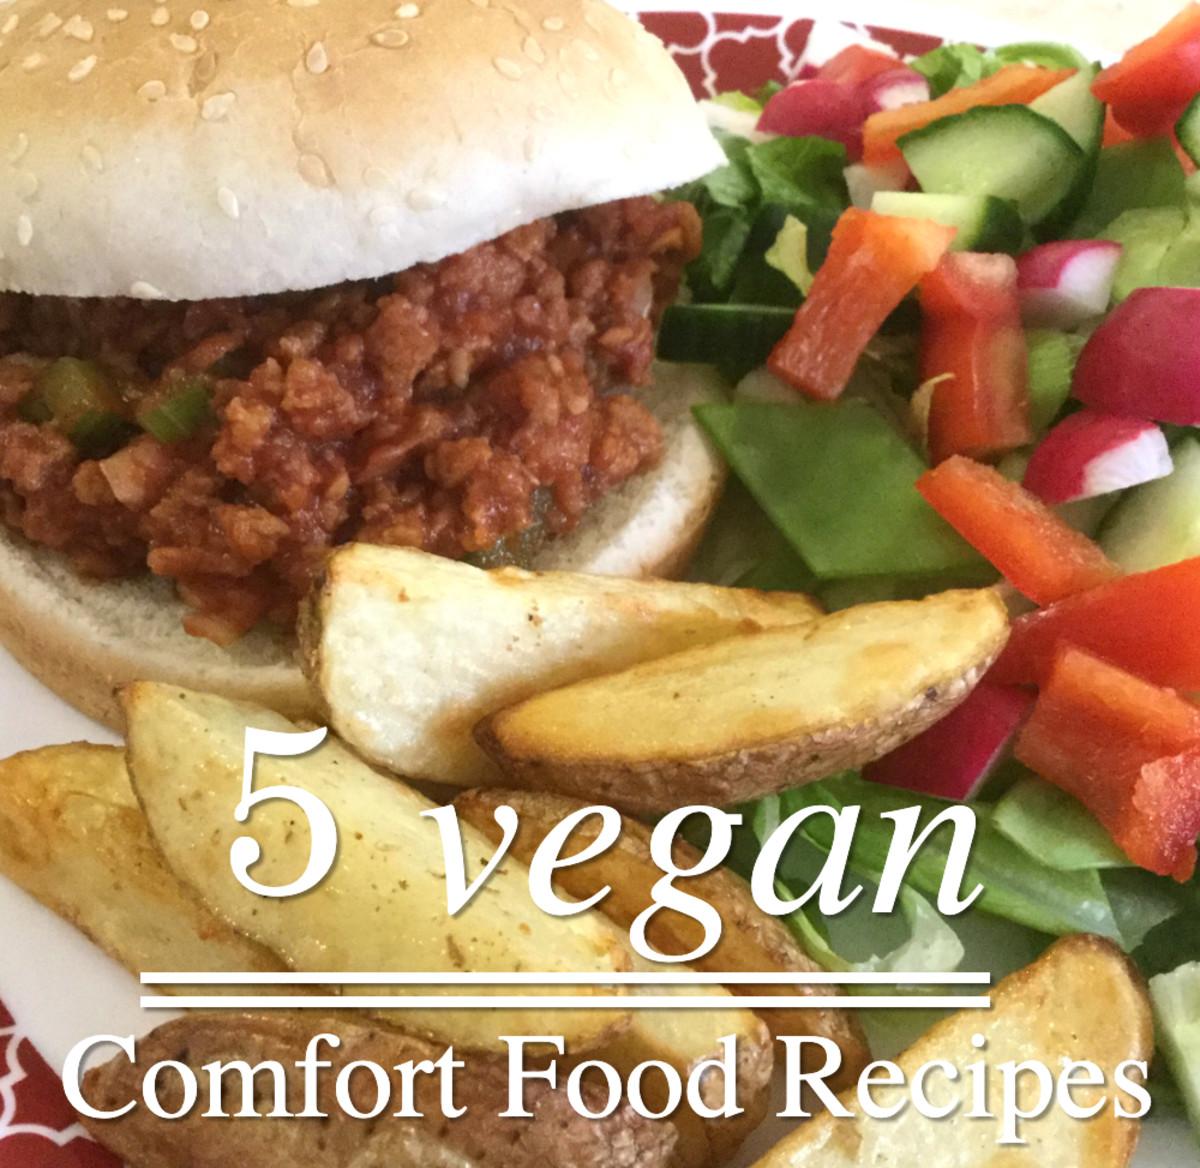 Top 5 Vegan Comfort Food Recipes